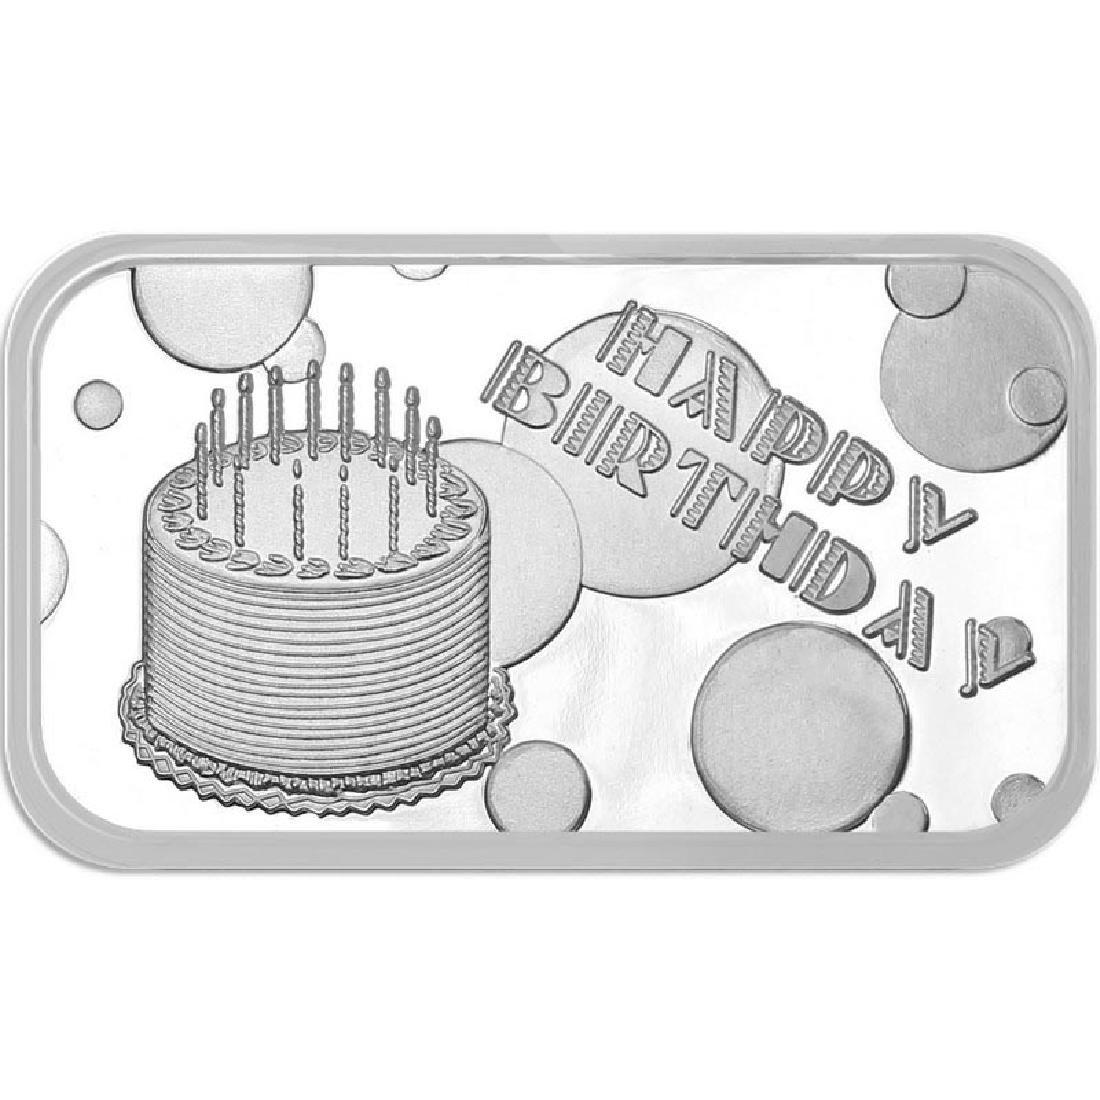 Happy Birthday Cake 2019 .999 Silver 1 oz Bar